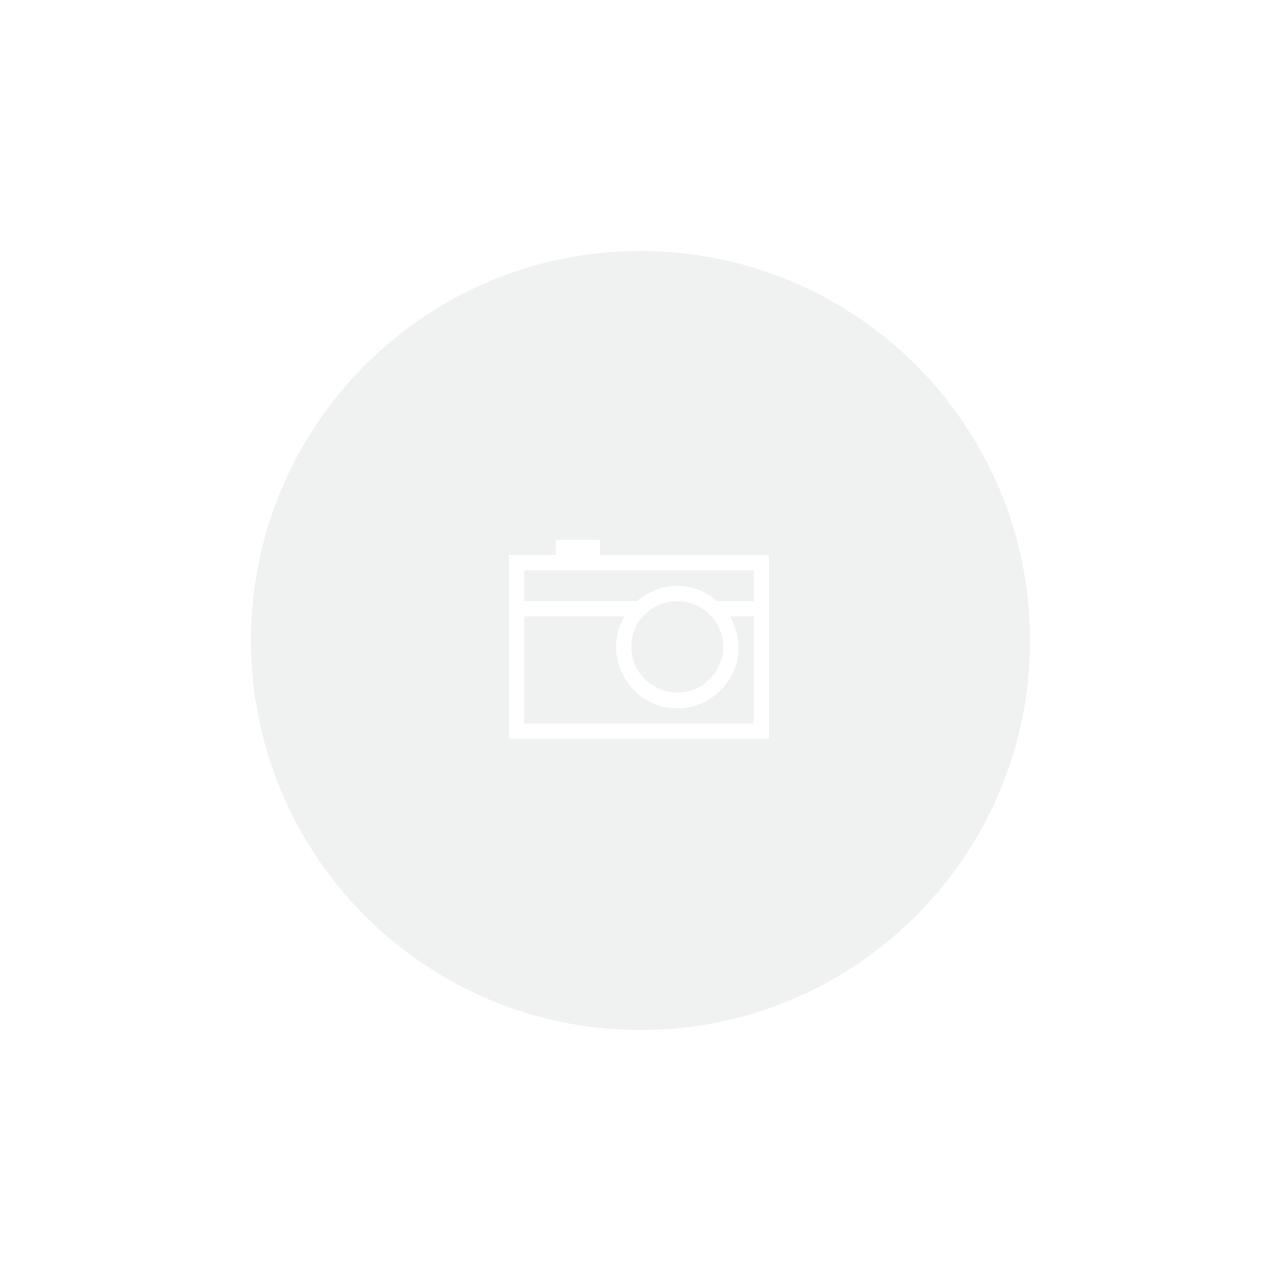 Stickers - Ref. 753D